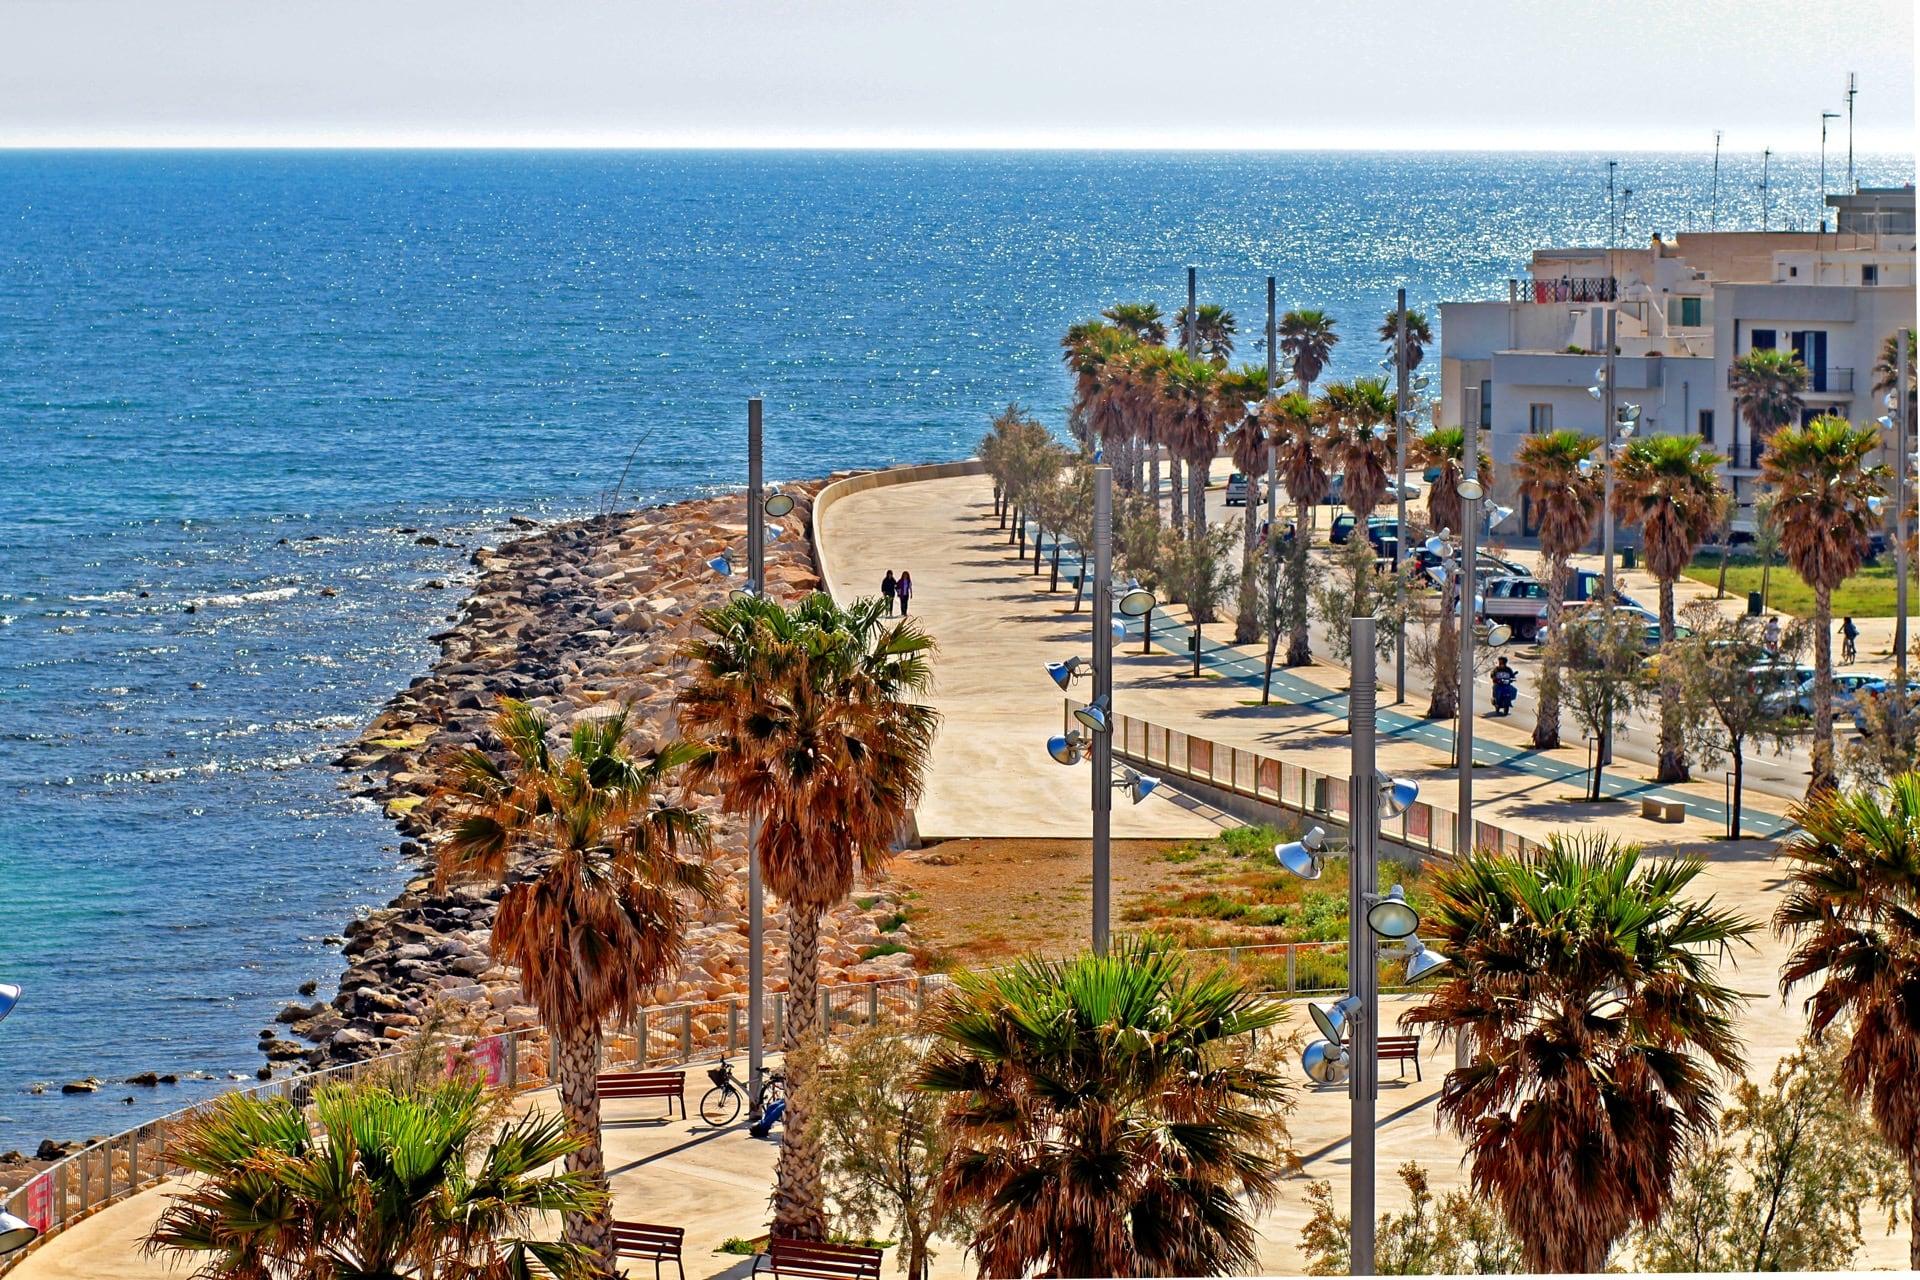 Shopping-&-Drink-Visit-Mola-di-Bari-Puglia